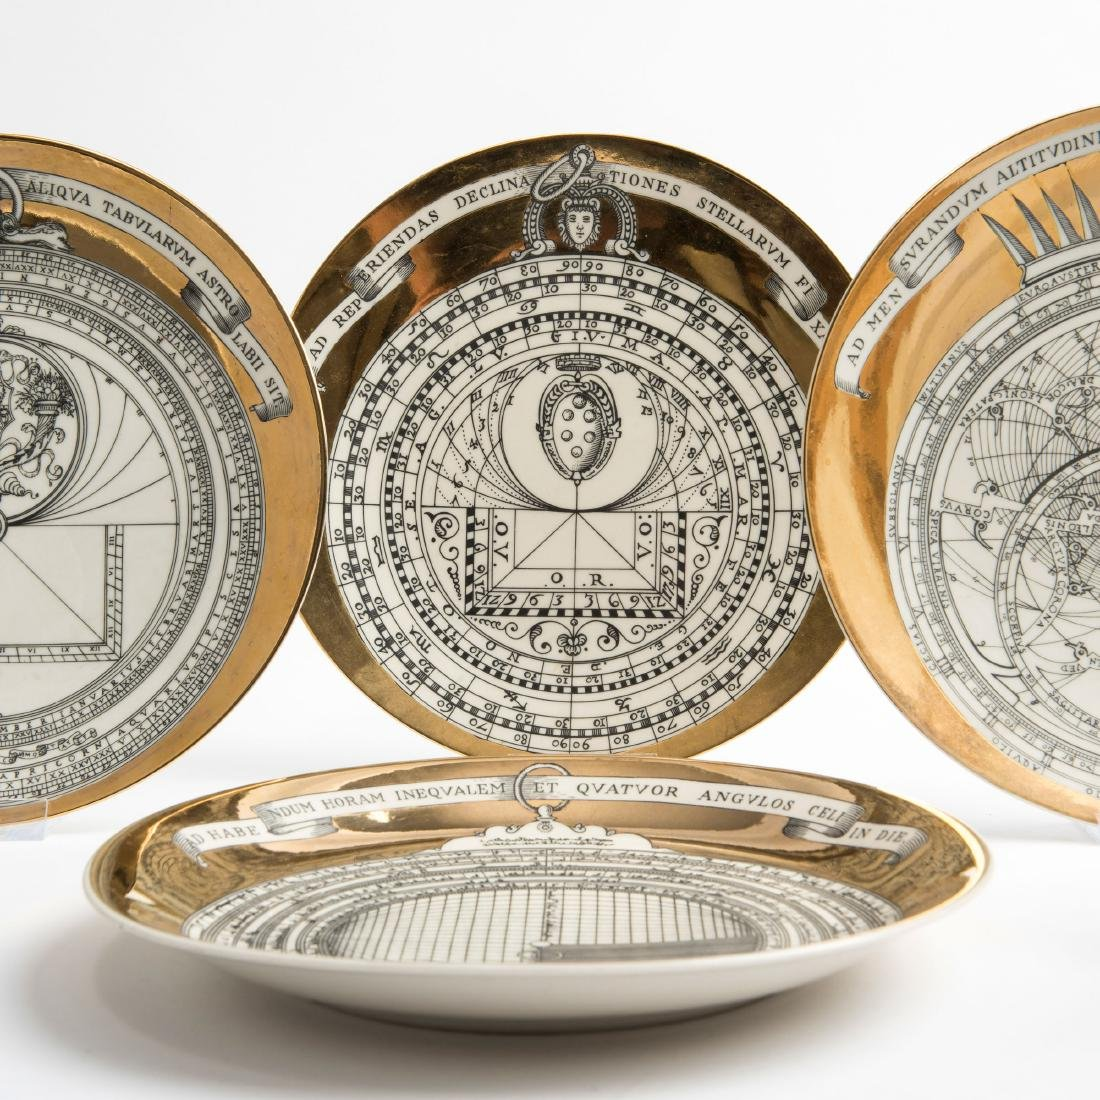 Six 'Astrolabio' plates, 1965 - 2